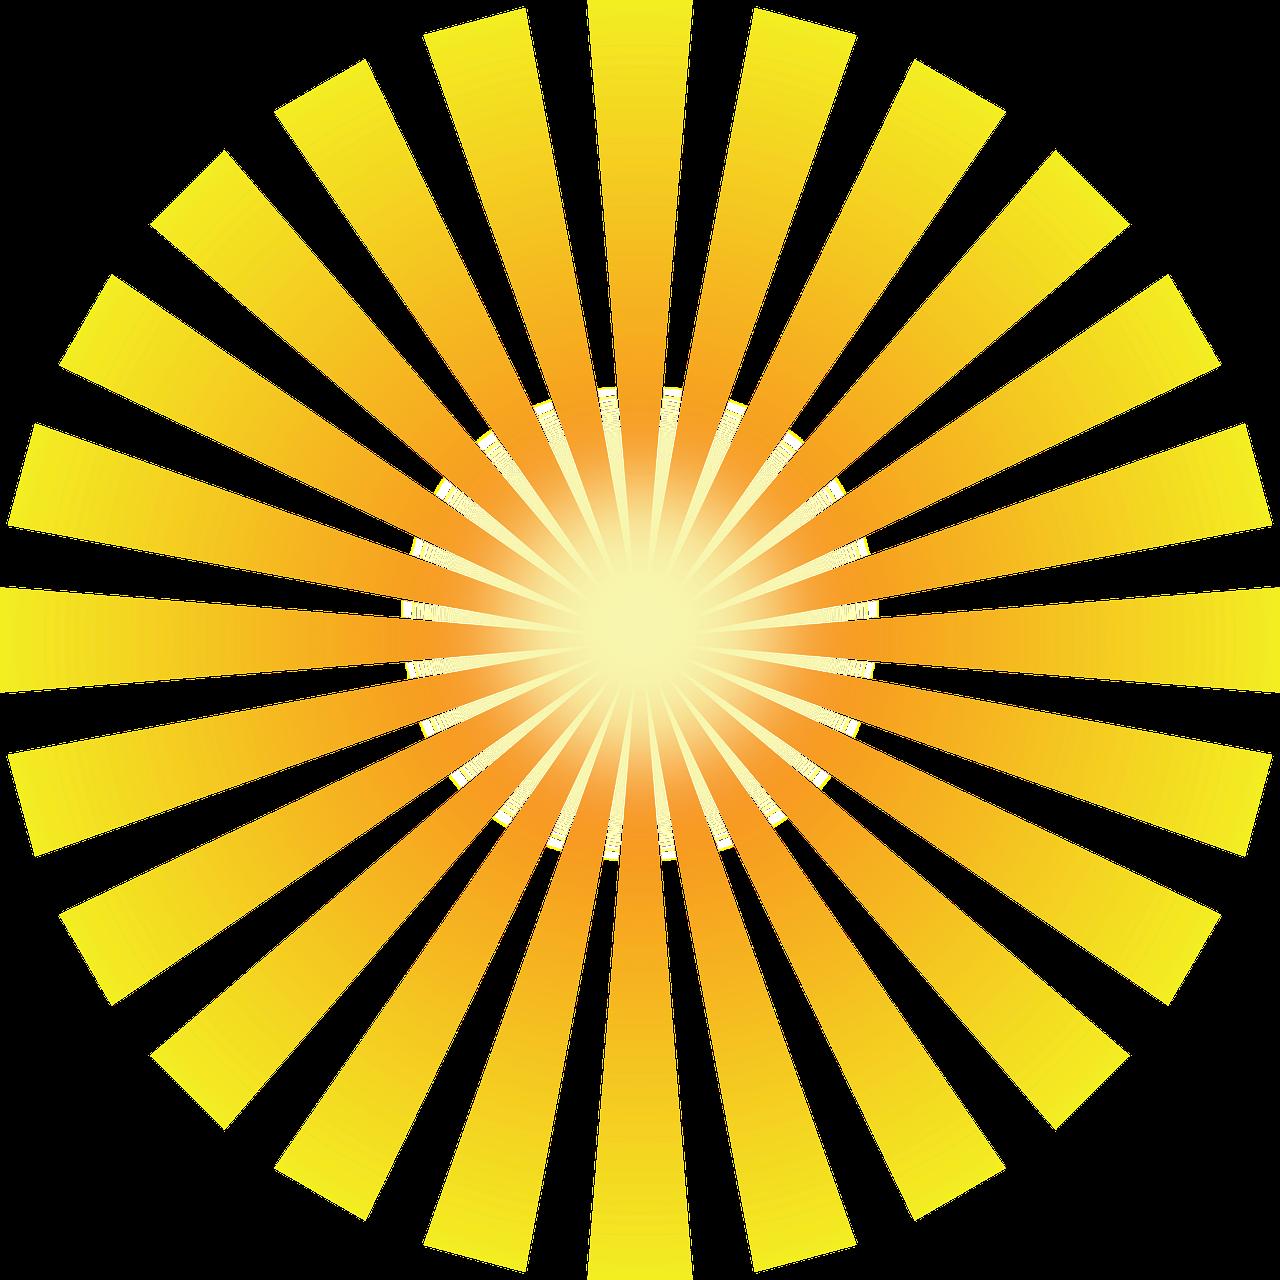 Shine Png / Sunlight, golden shine light effect element transparent background png clipart.